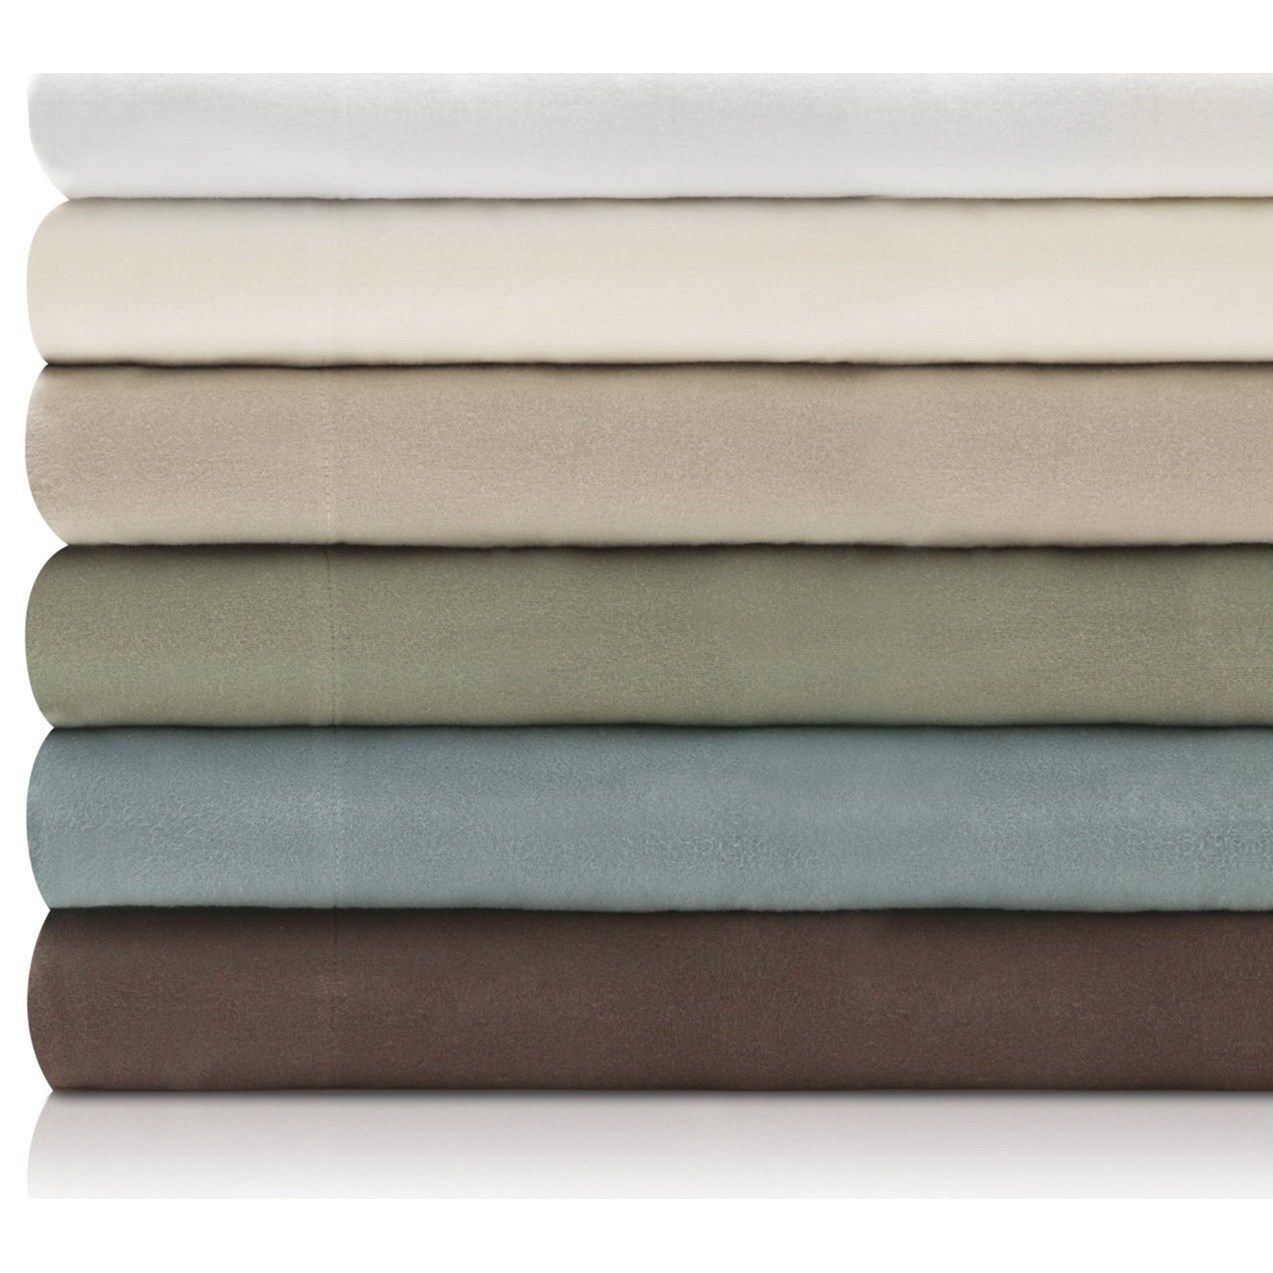 Malouf Portuguese Flannel Cal King Woven™ Portuguese Flannel Sheet Set - Item Number: WO19CKCOFS